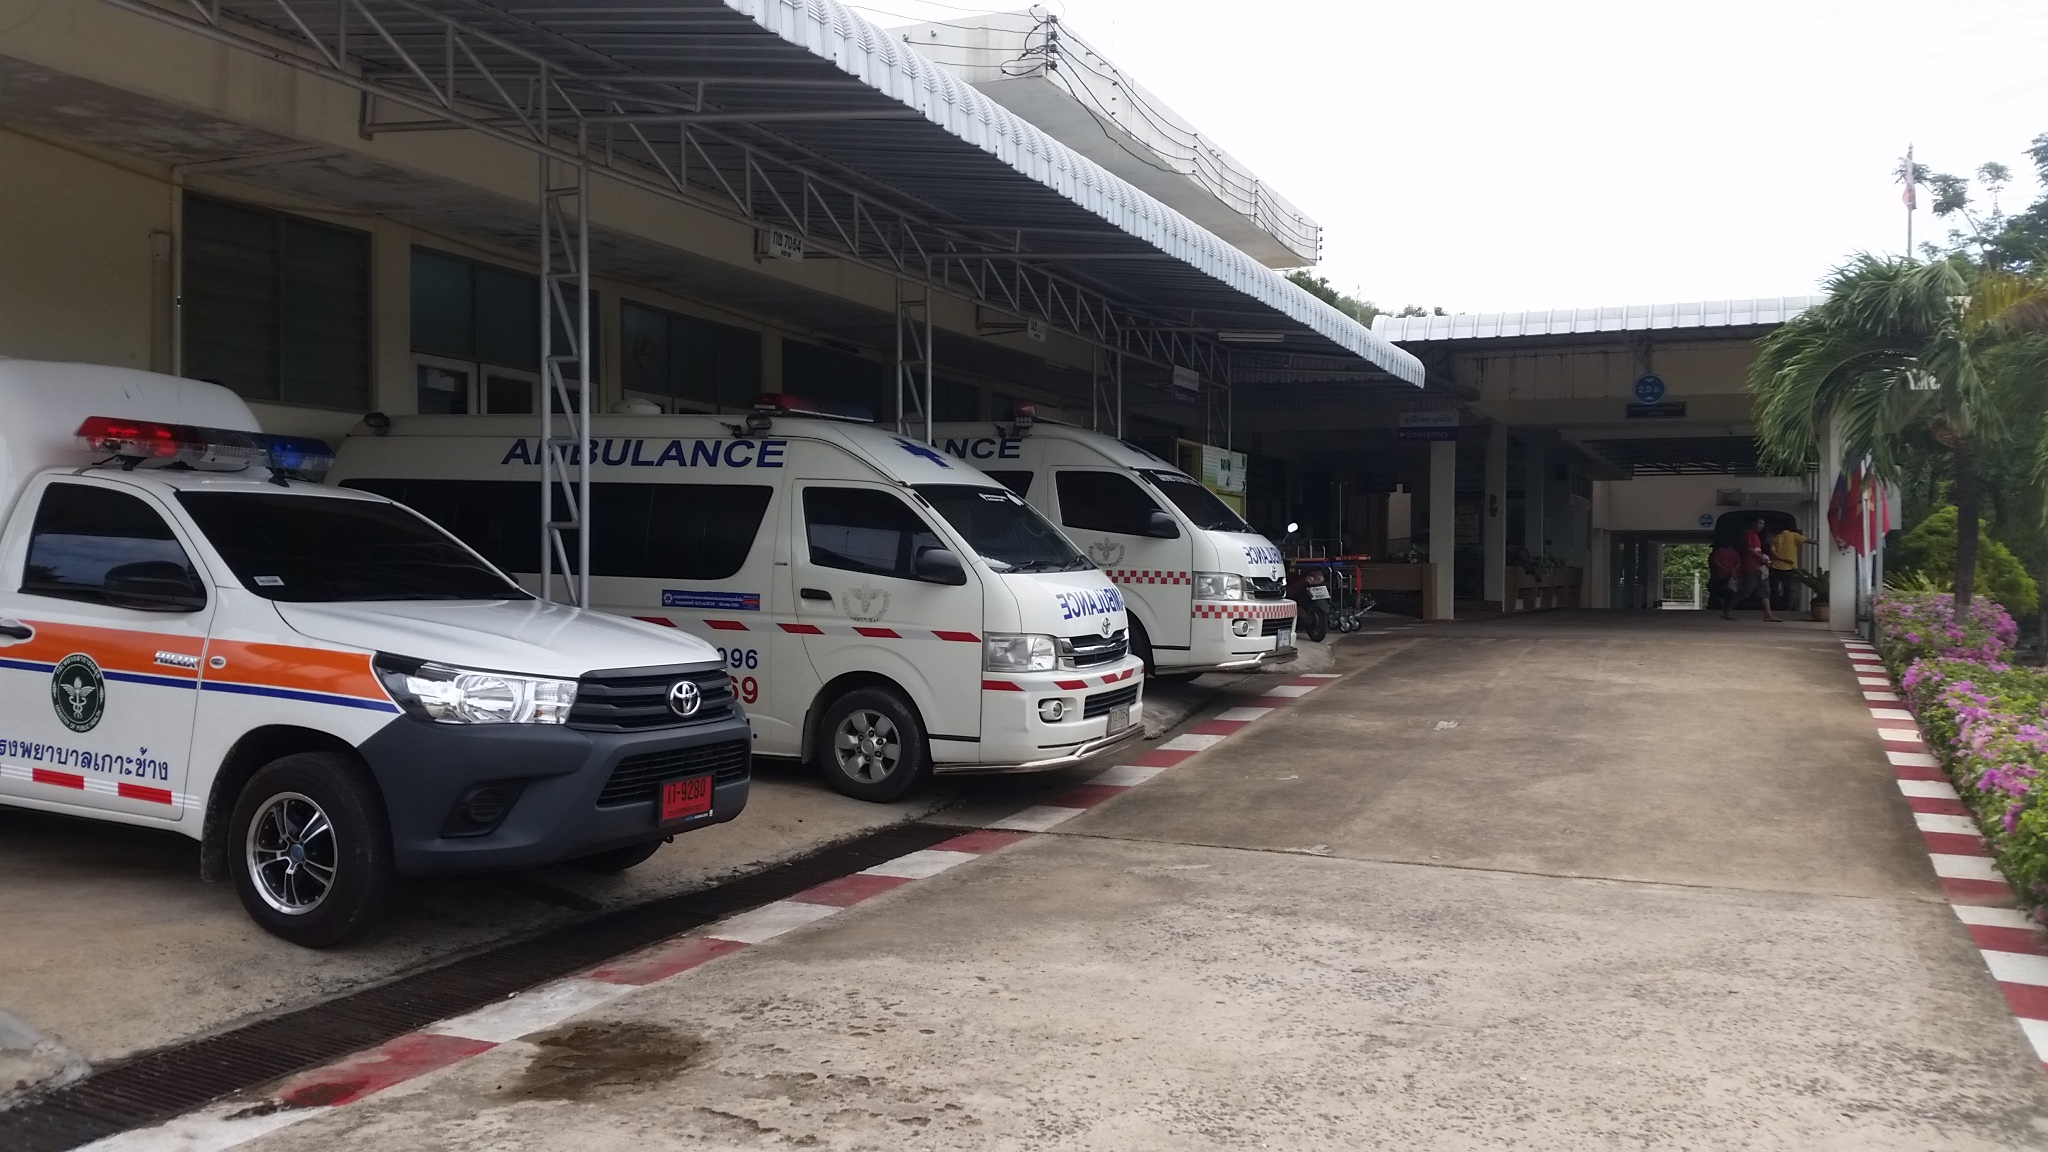 koh chang hospital ambulance